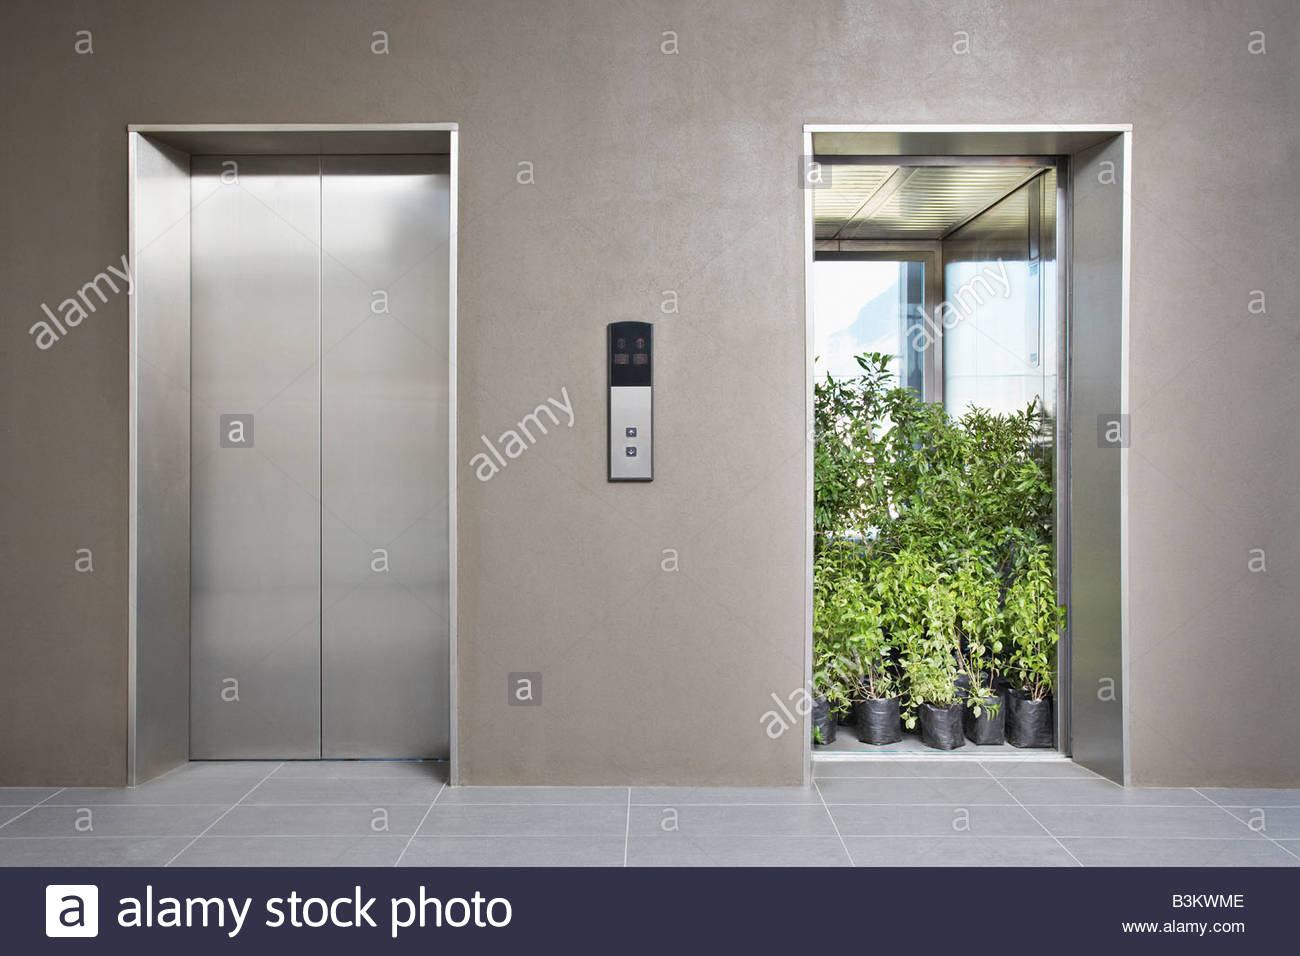 Office elevator full of plants - Stock Image